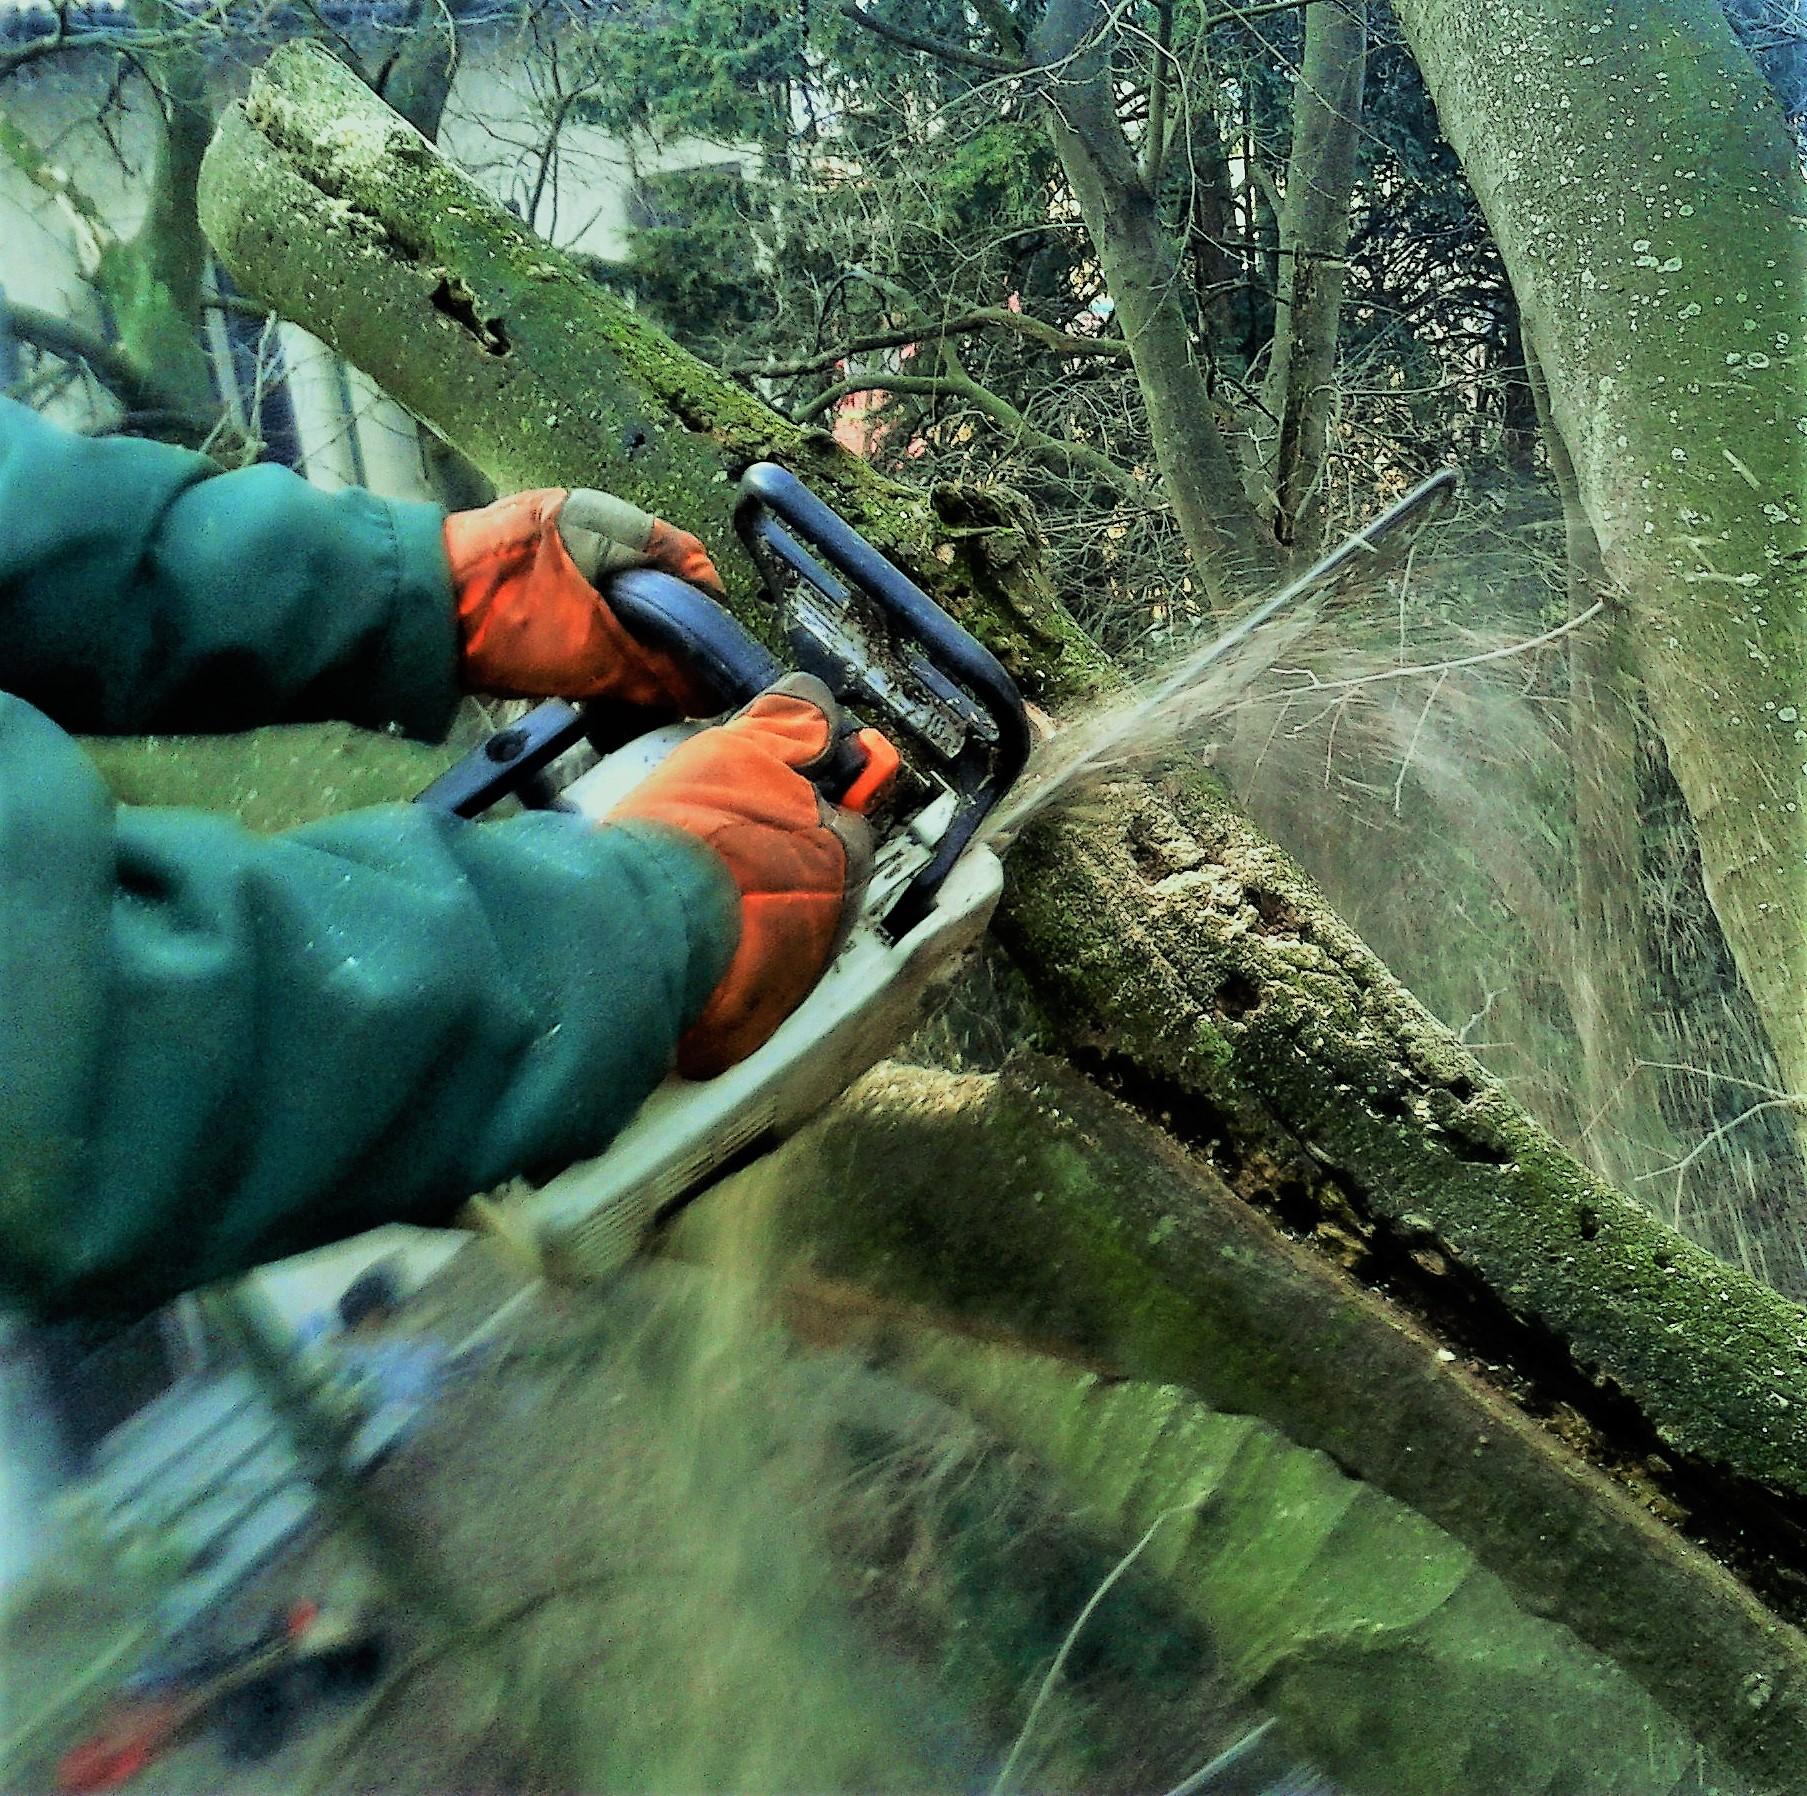 Potature Gallarate Manutenzione del verde